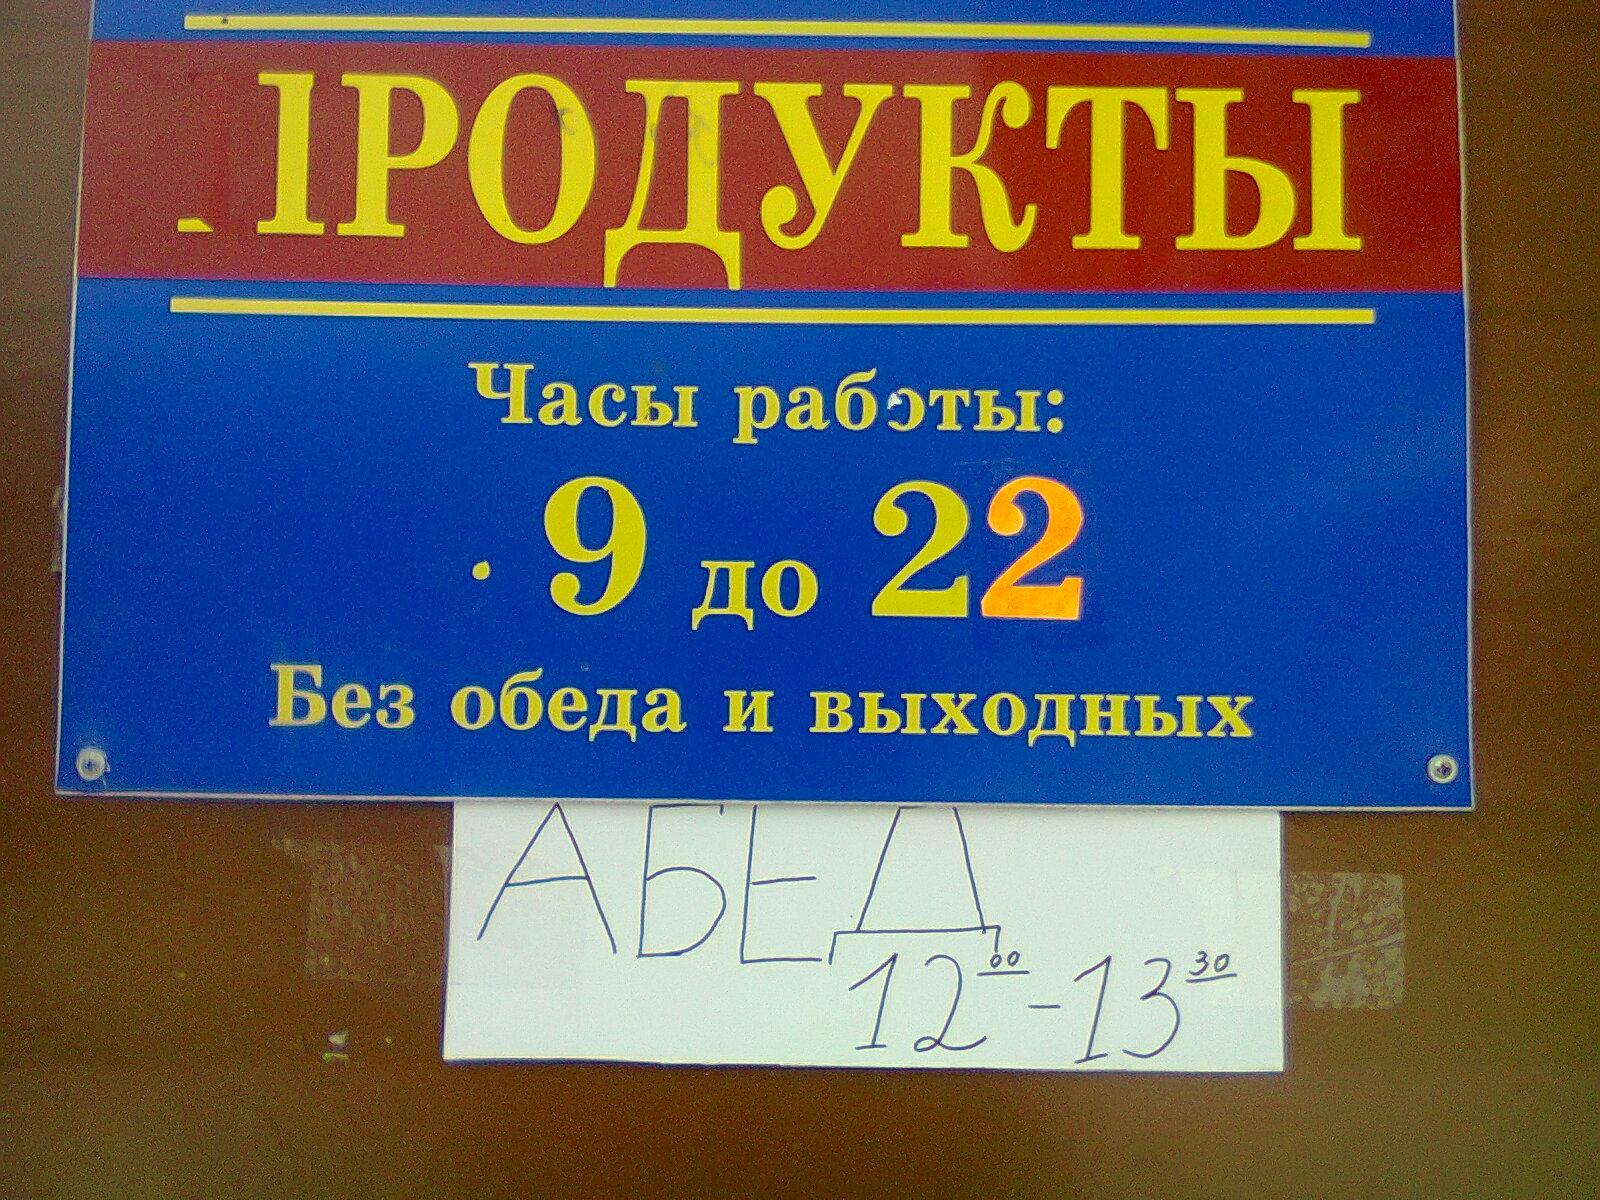 http://forum.darnet.ru/img_attach/1095.jpg